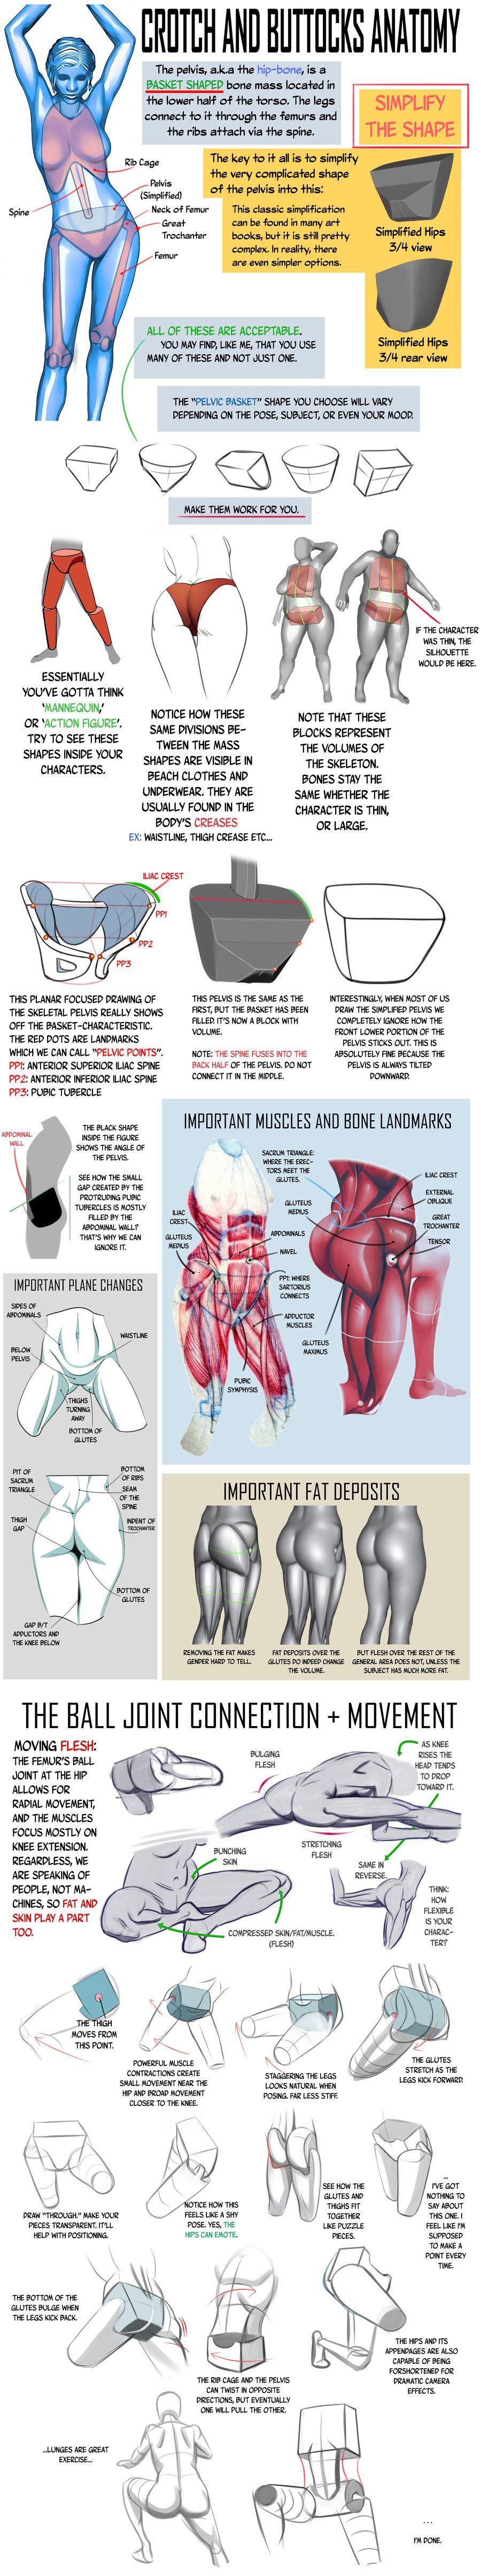 Crotch and Buttocks Anatomy by NemoNova on DeviantArt | Anatomy ...